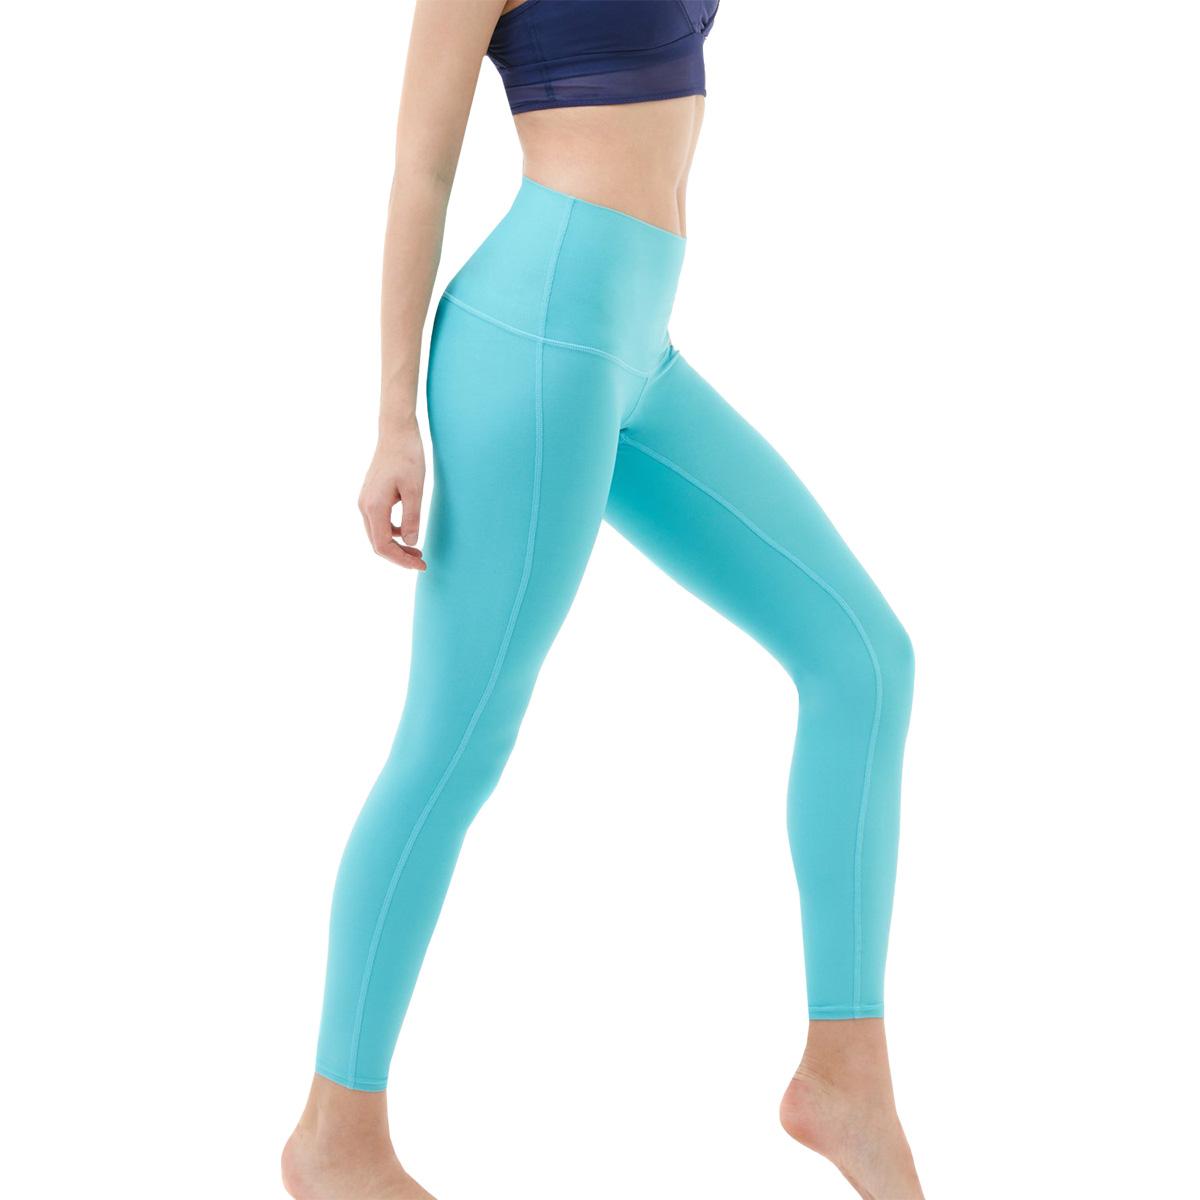 thumbnail 2 - TSLA Tesla FYP42 Women's High-Waisted Ultra-Stretch Tummy Control Yoga Pants